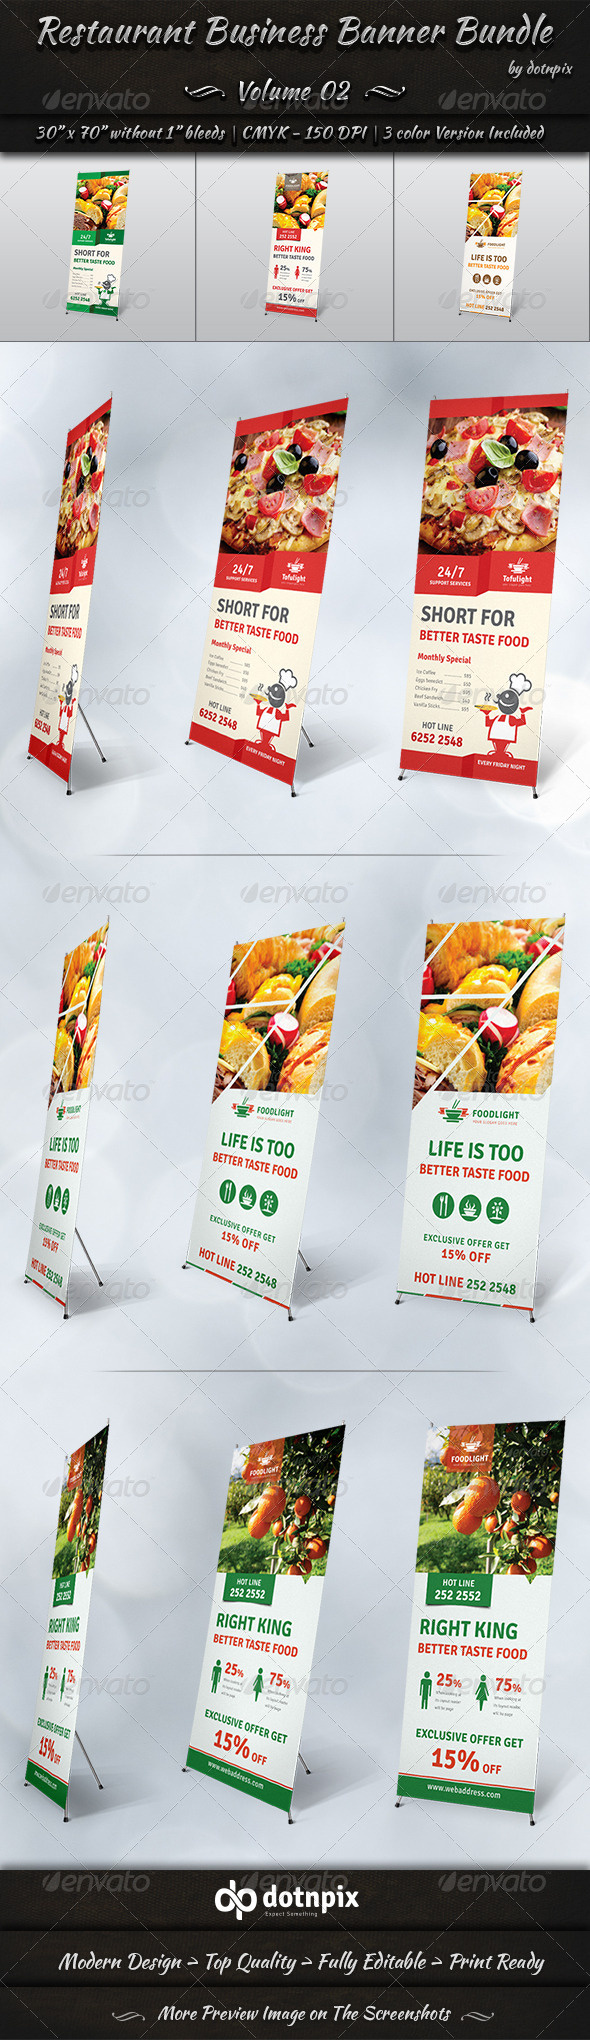 GraphicRiver Restaurant Business Banner Bundle Volume 2 7699923